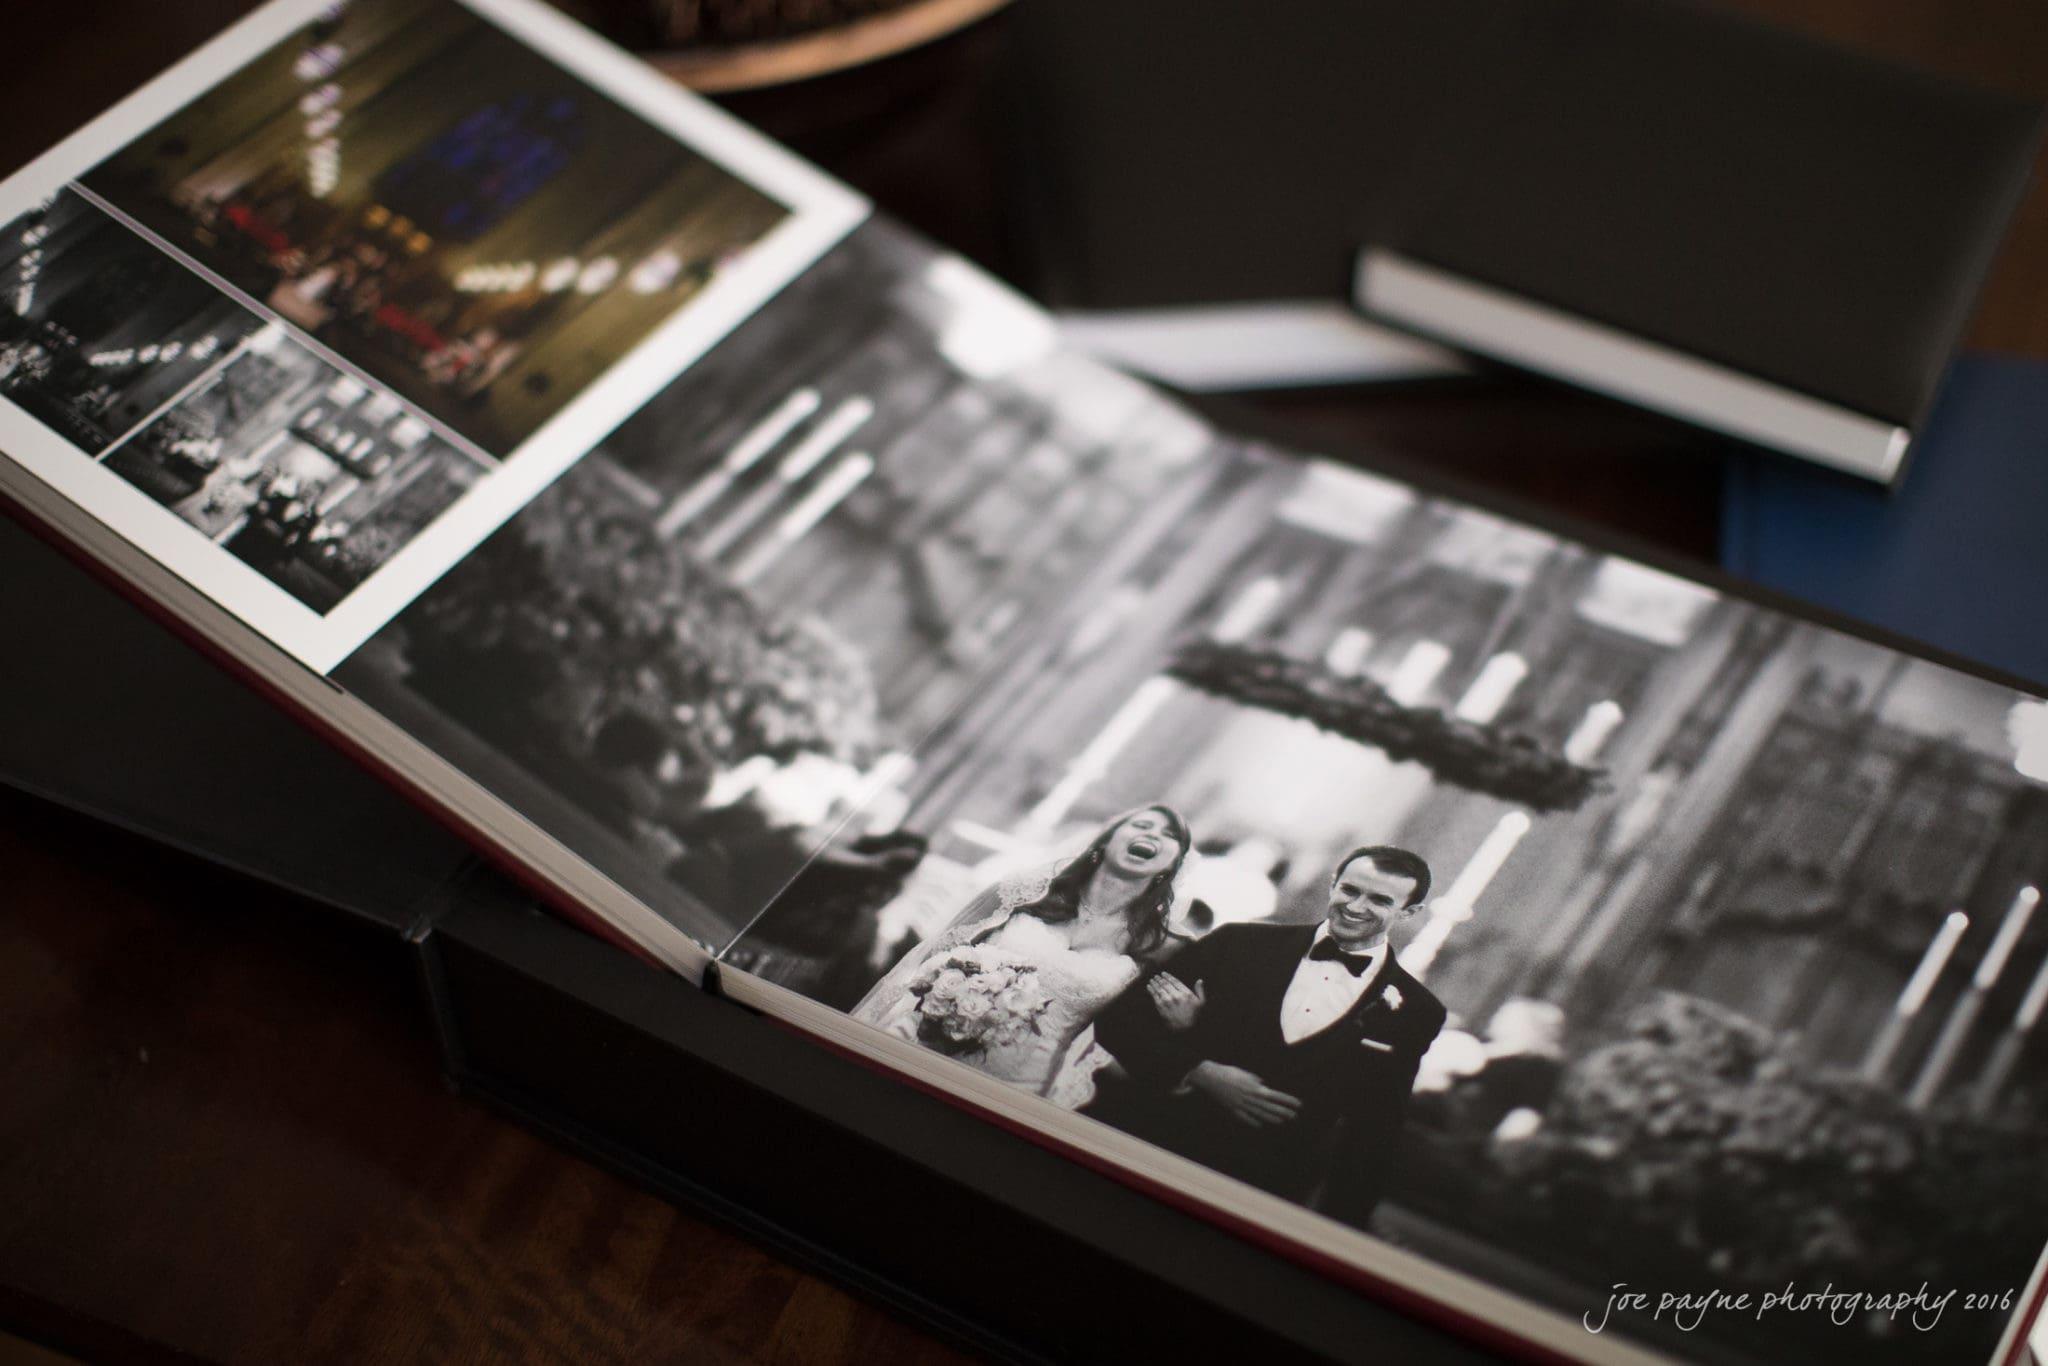 raleigh-wedding-photographer-joe-payne-photography-albums-2